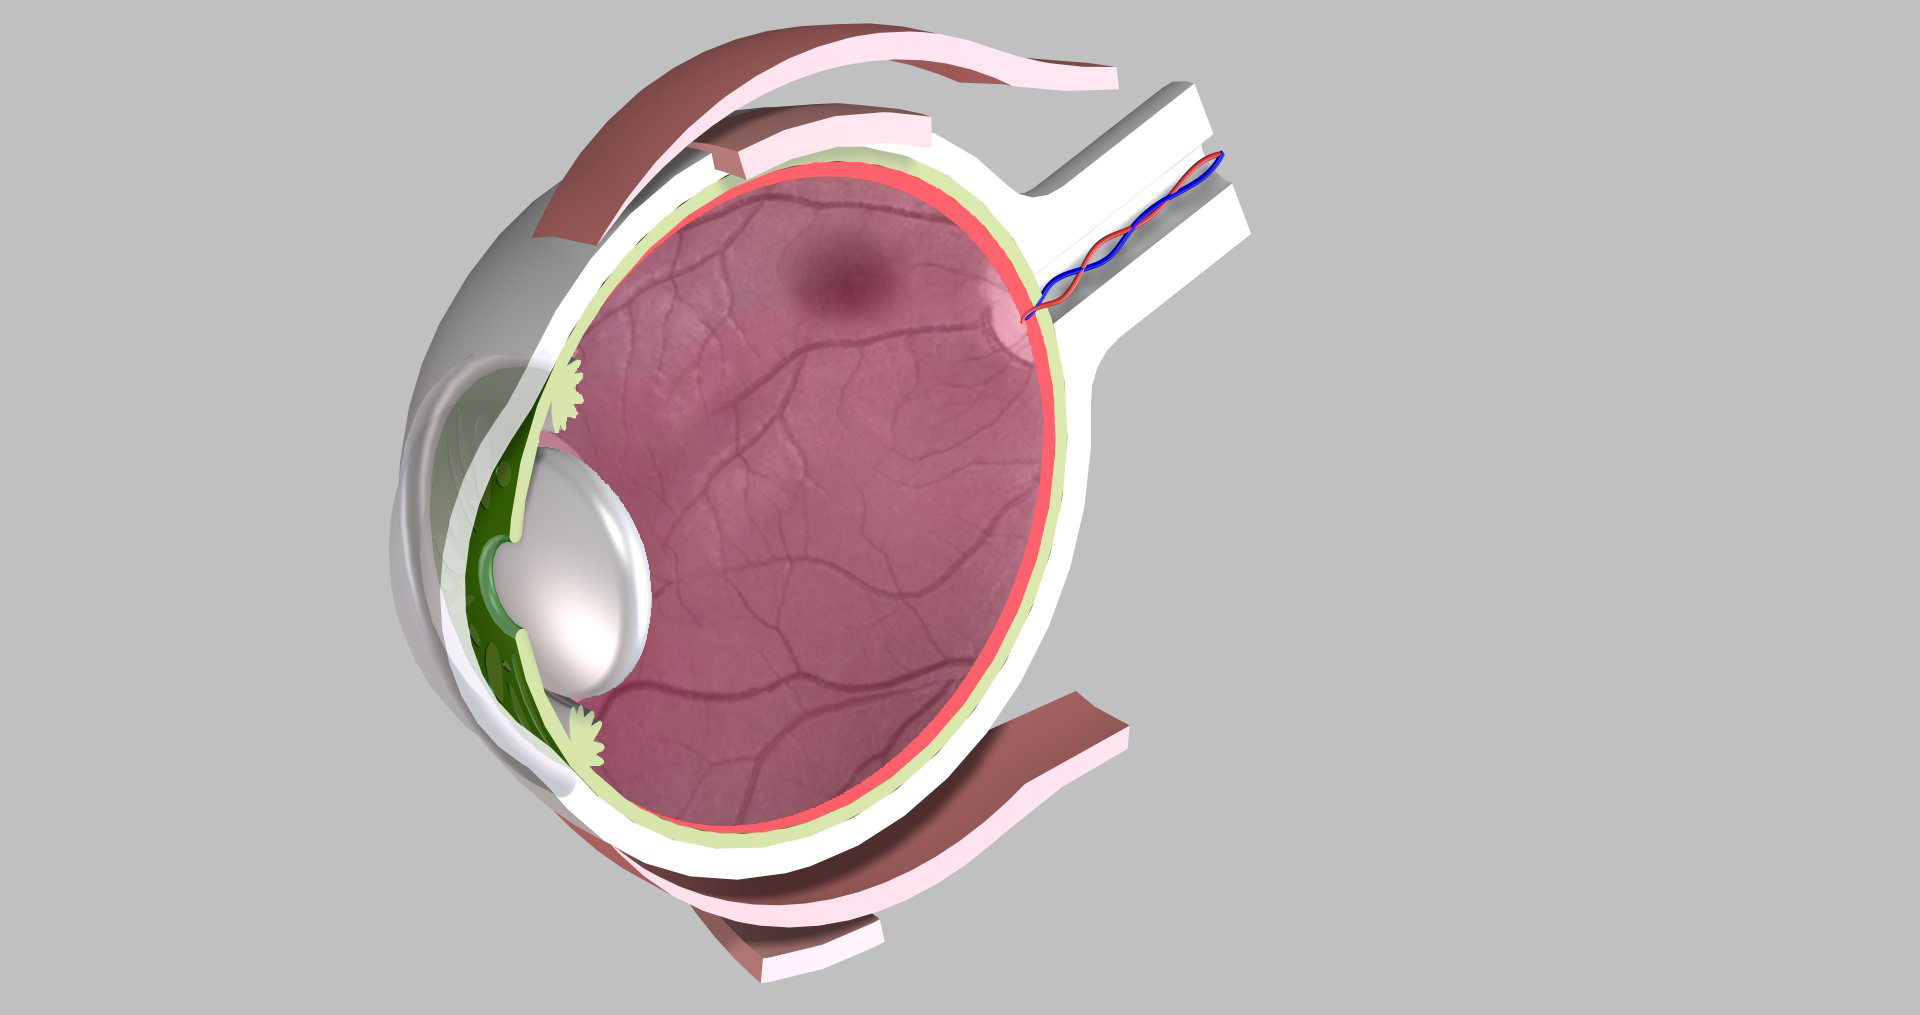 oogziektes bij diabetes